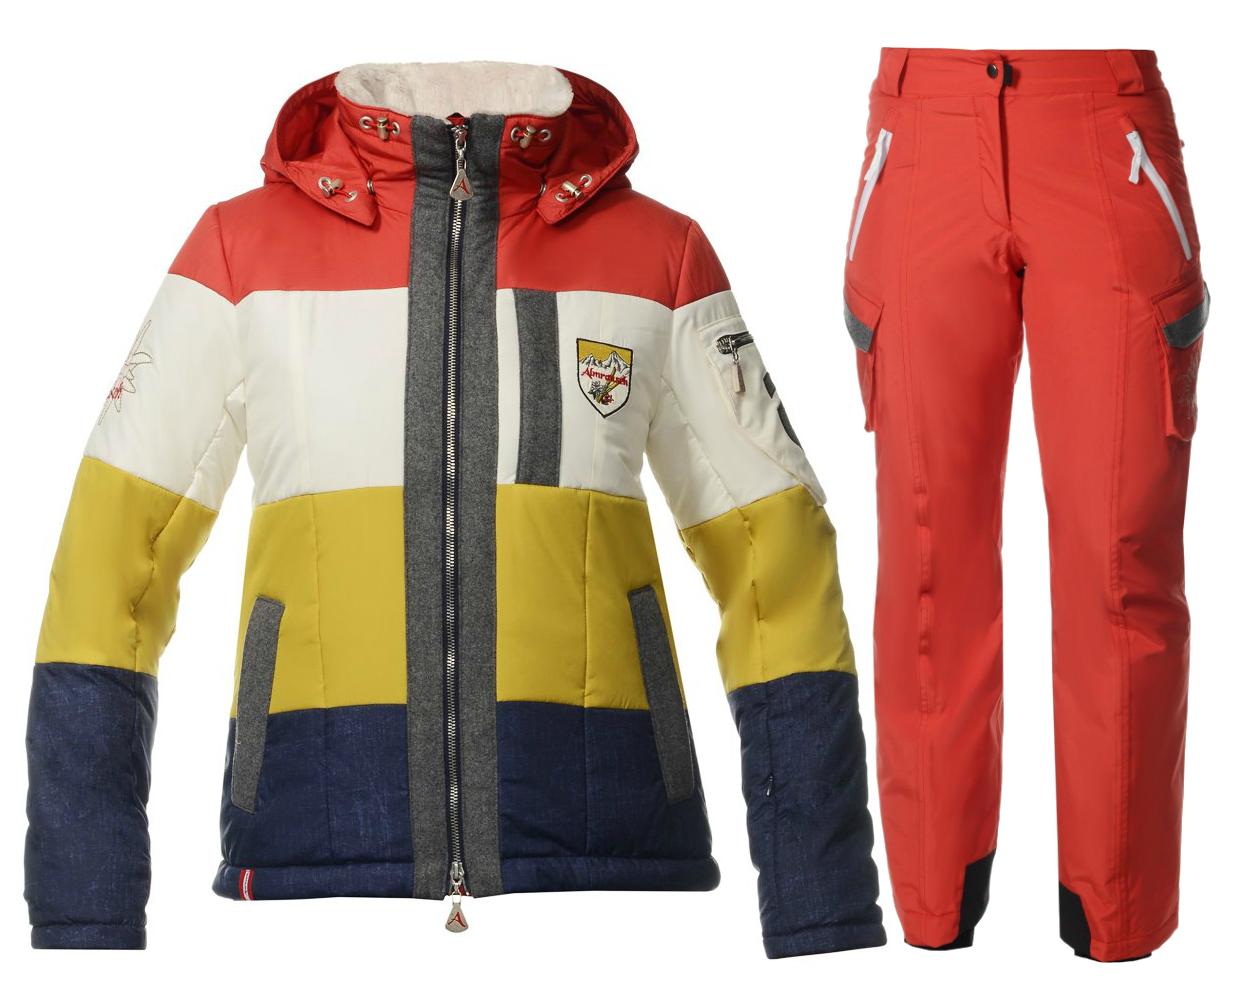 5dfc85c7a302 Женский горнолыжный костюм Almrausch Steinberg-Hochegg красный фото